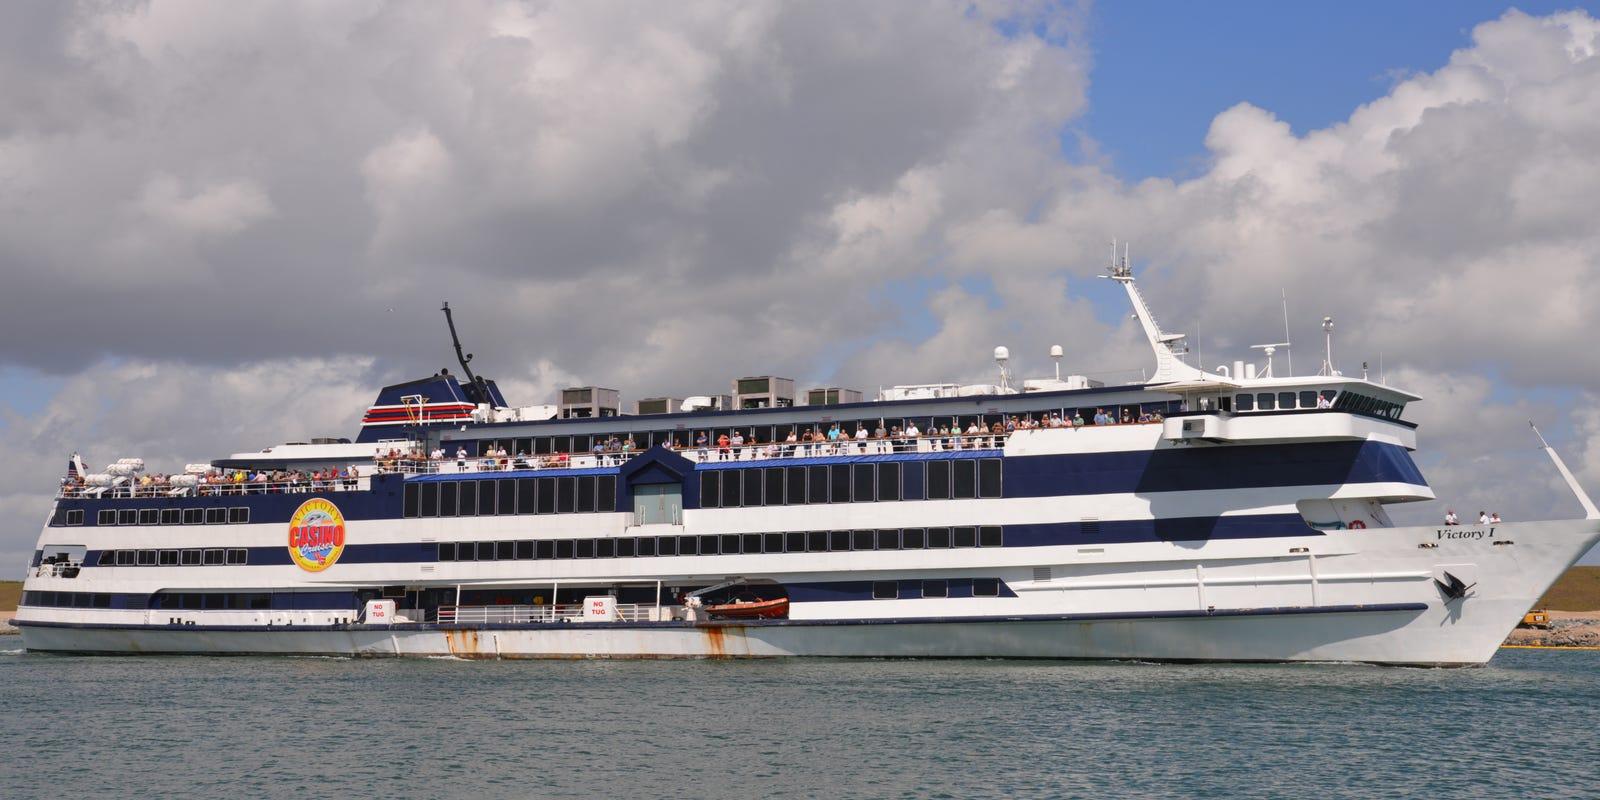 Victory Casino Cruise Free Boarding